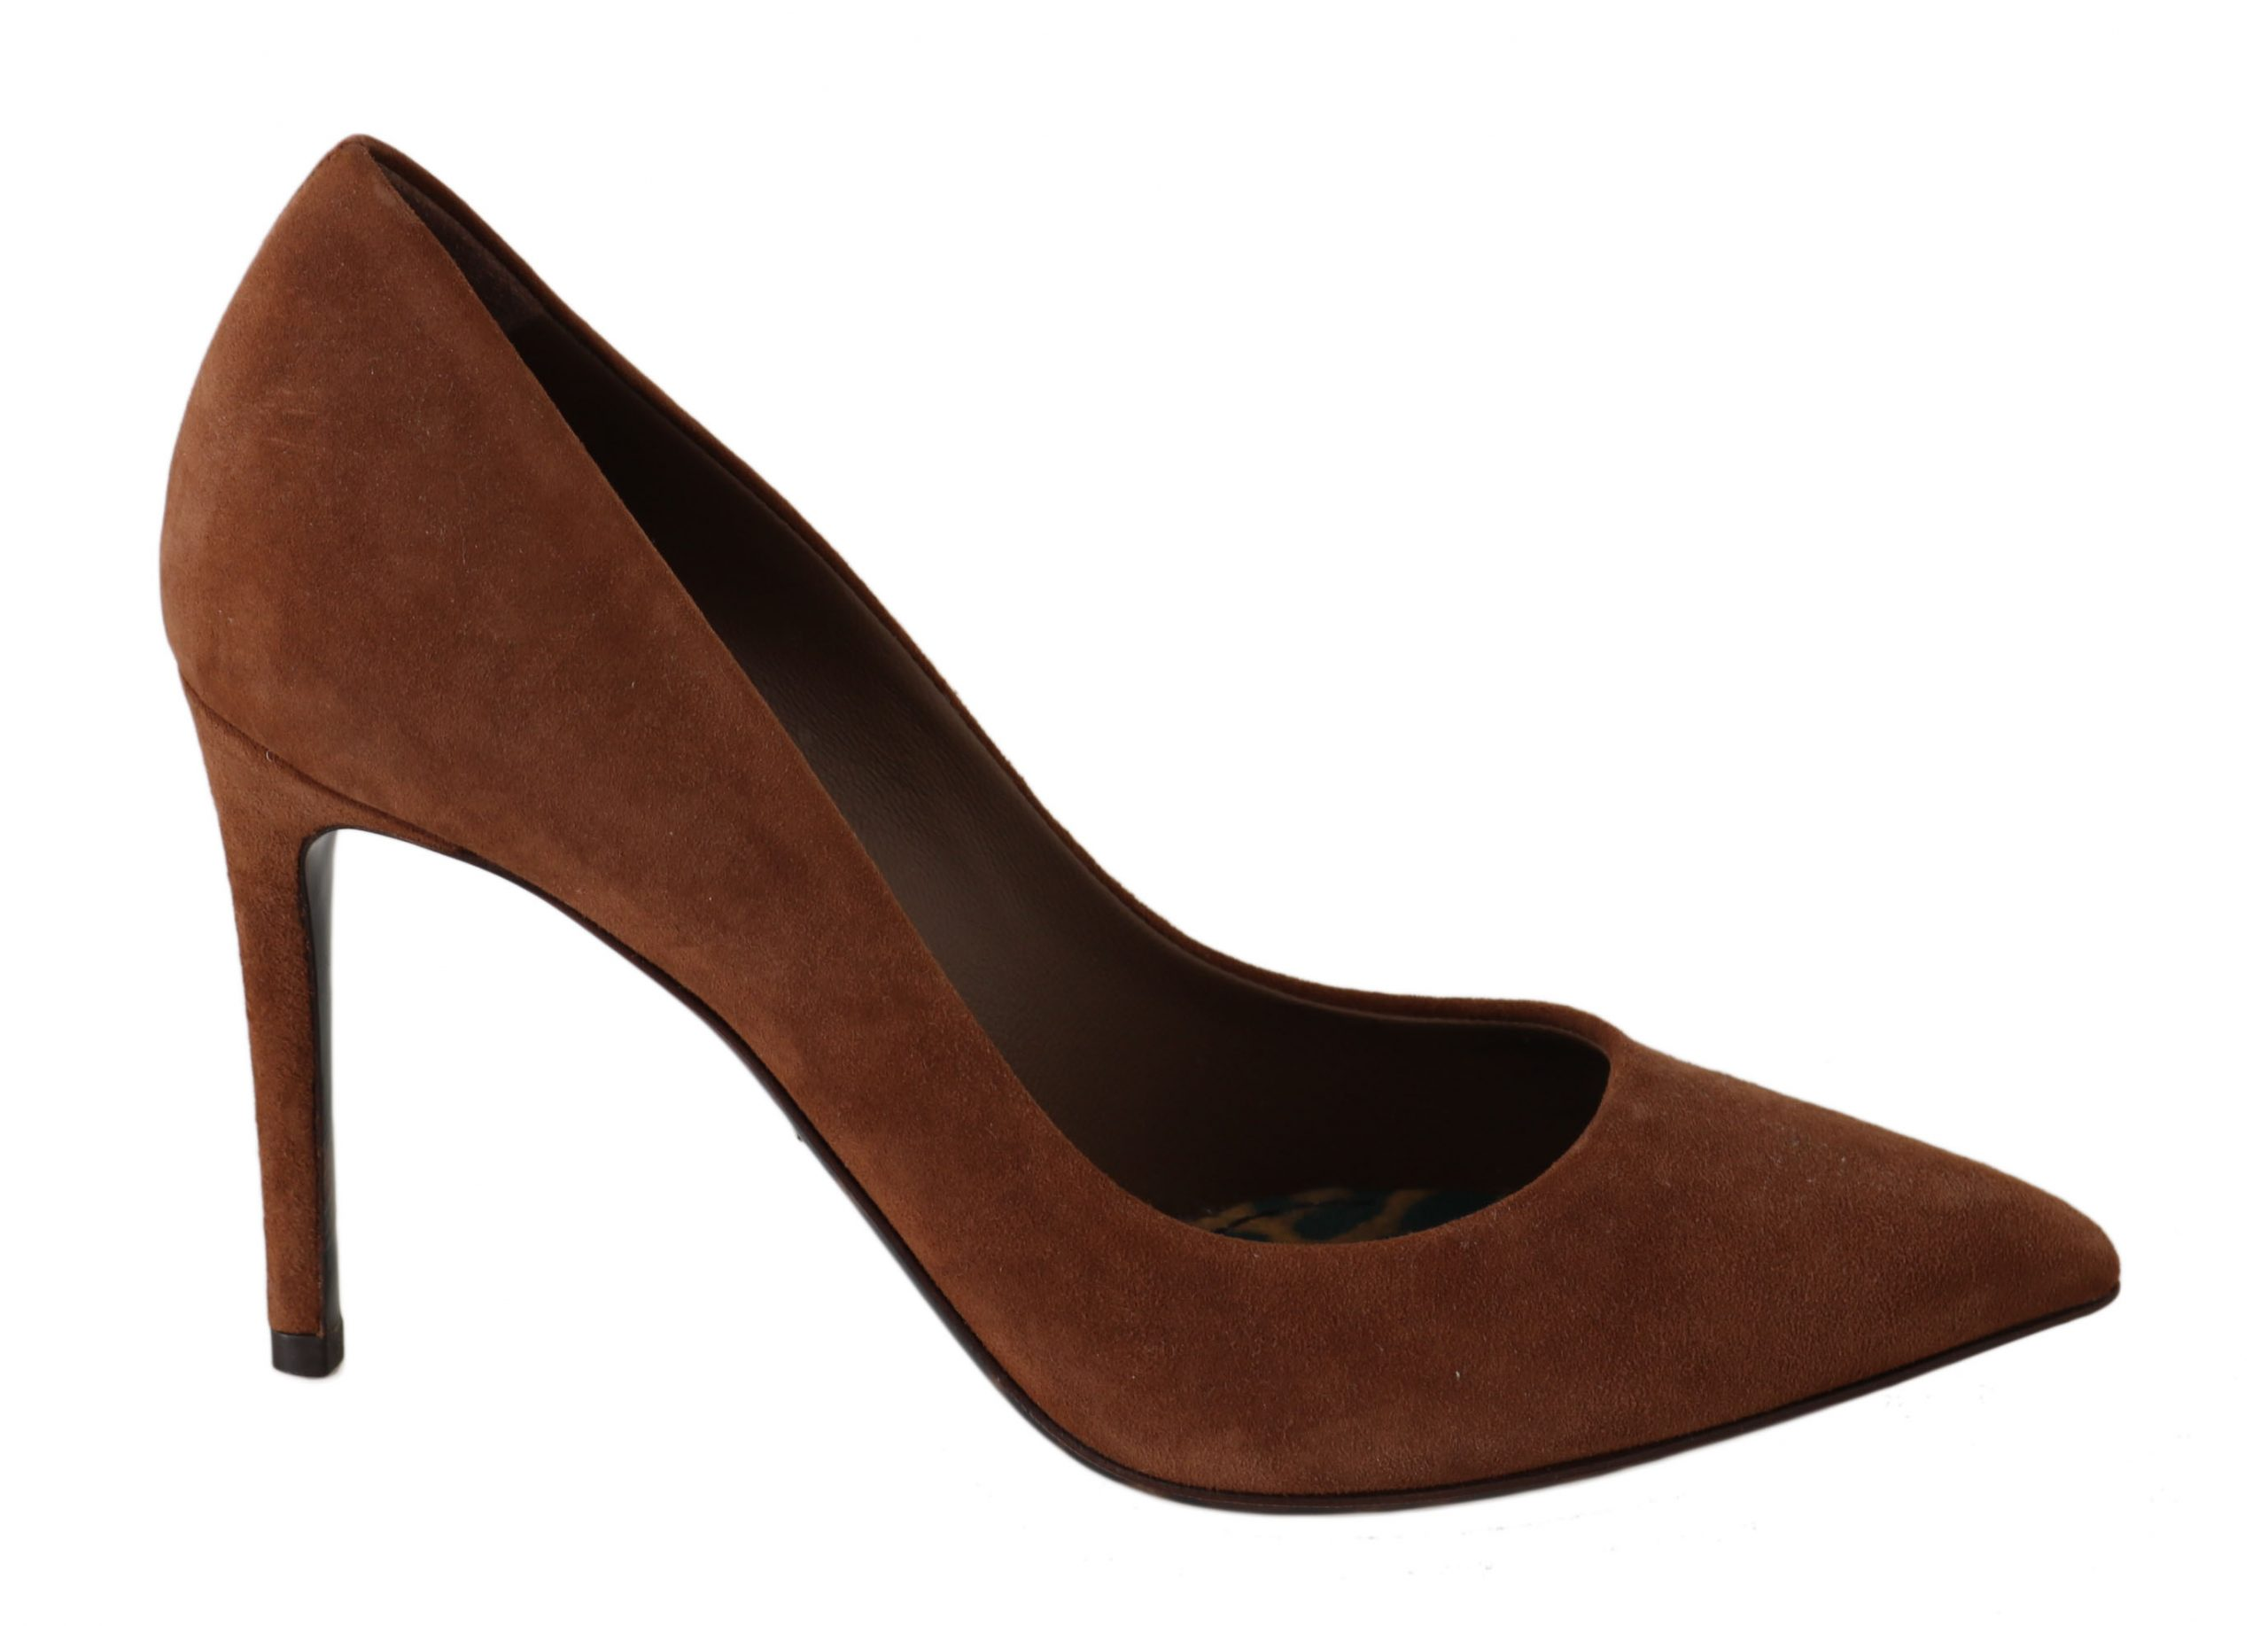 Dolce & Gabbana Women's Heels Shoes Brown LA5983 - EU35.5/US5